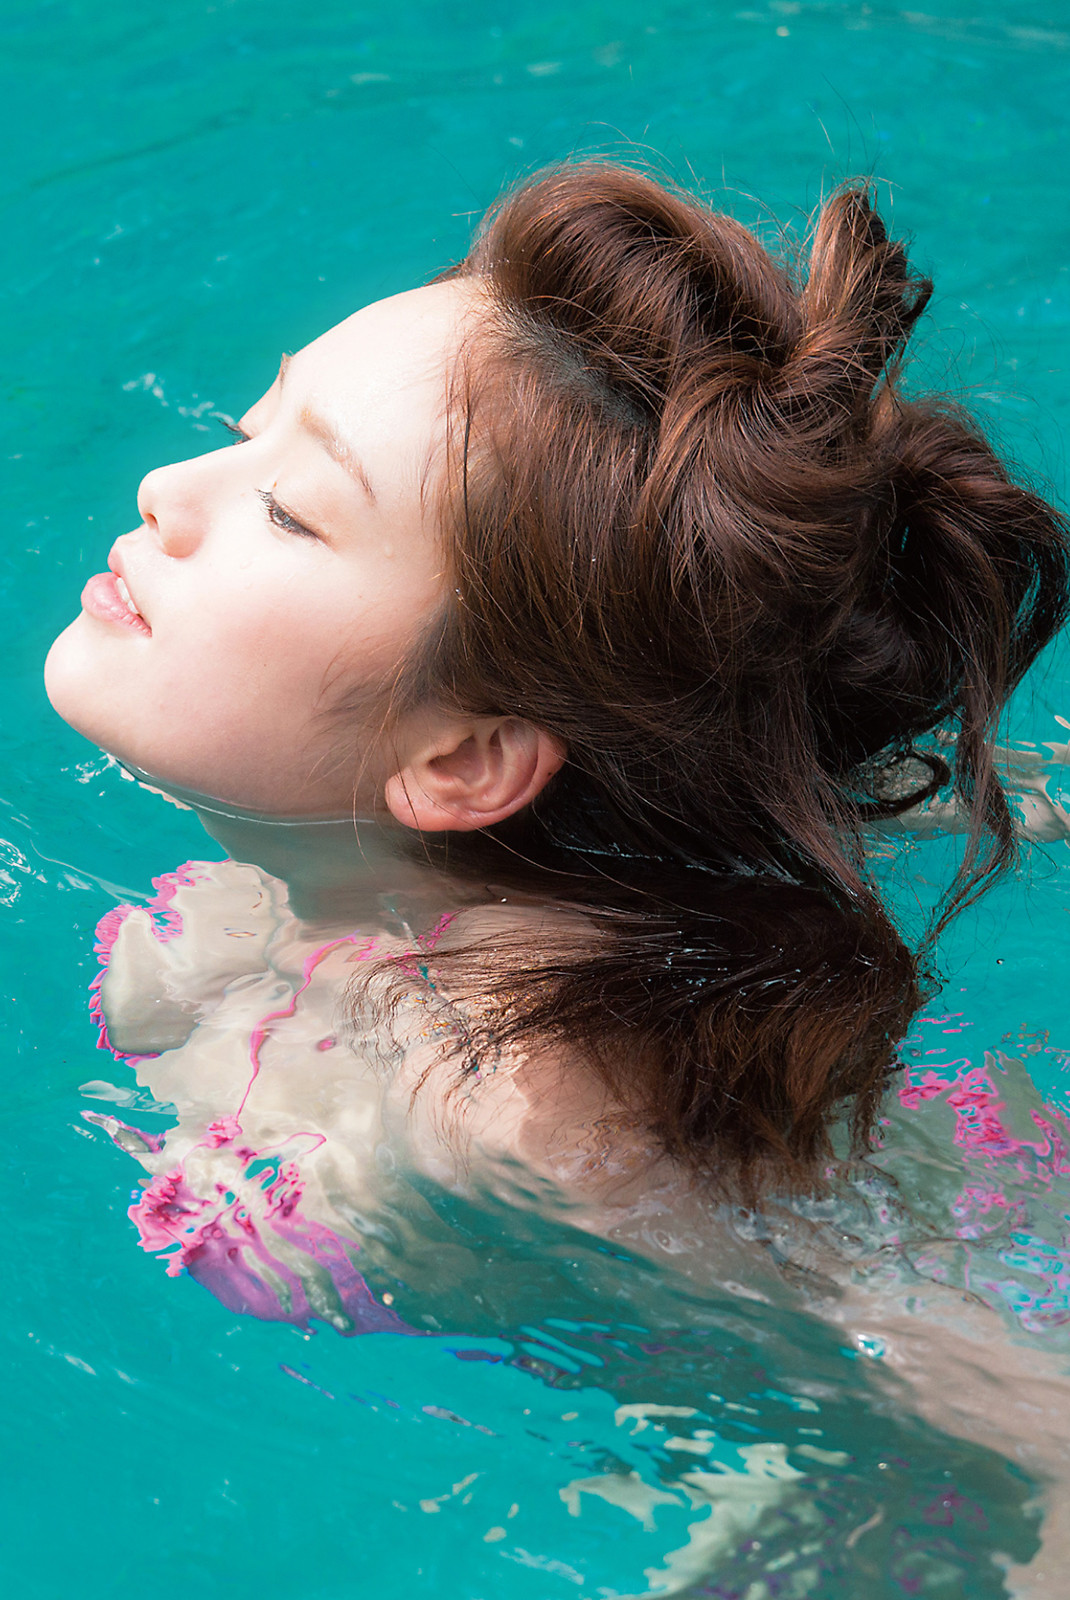 【おっぱいネキ】筧美和子さんの乳輪を隠す為の二プレスのサイズwwwwwwwwwwwwwwwwwwwwwwwww(画像あり)・8枚目